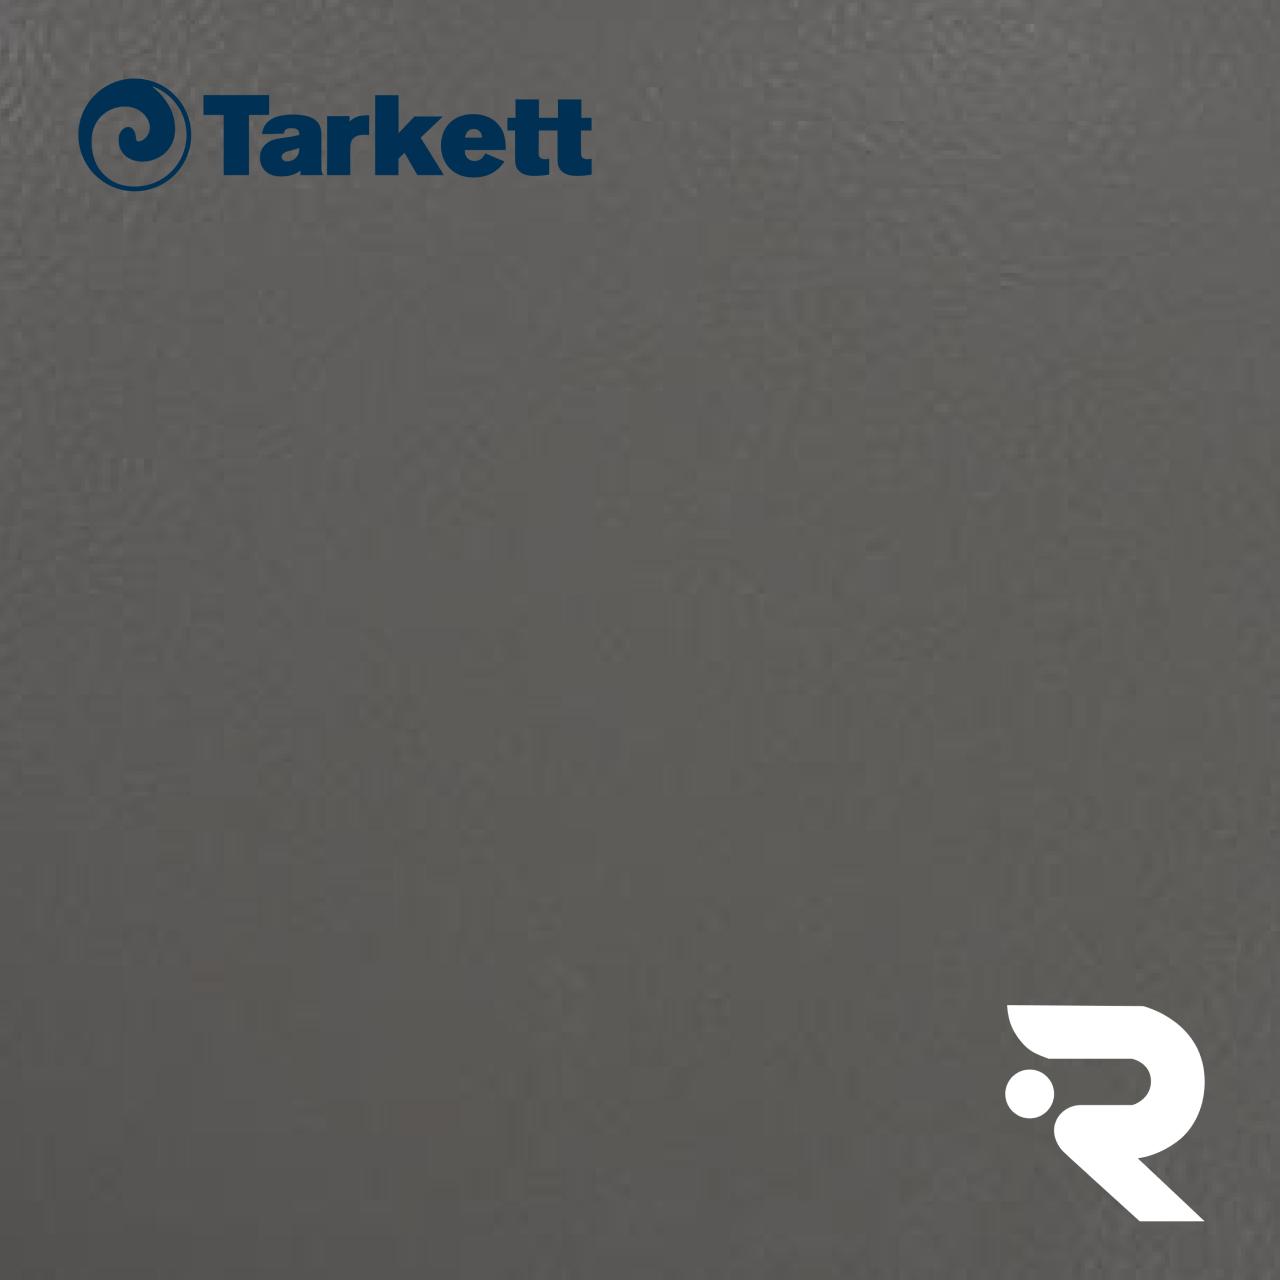 🏐 Спортивне покриття Tarkett | GREY | OMNISPORTS V35 | 2 х 20.5 м